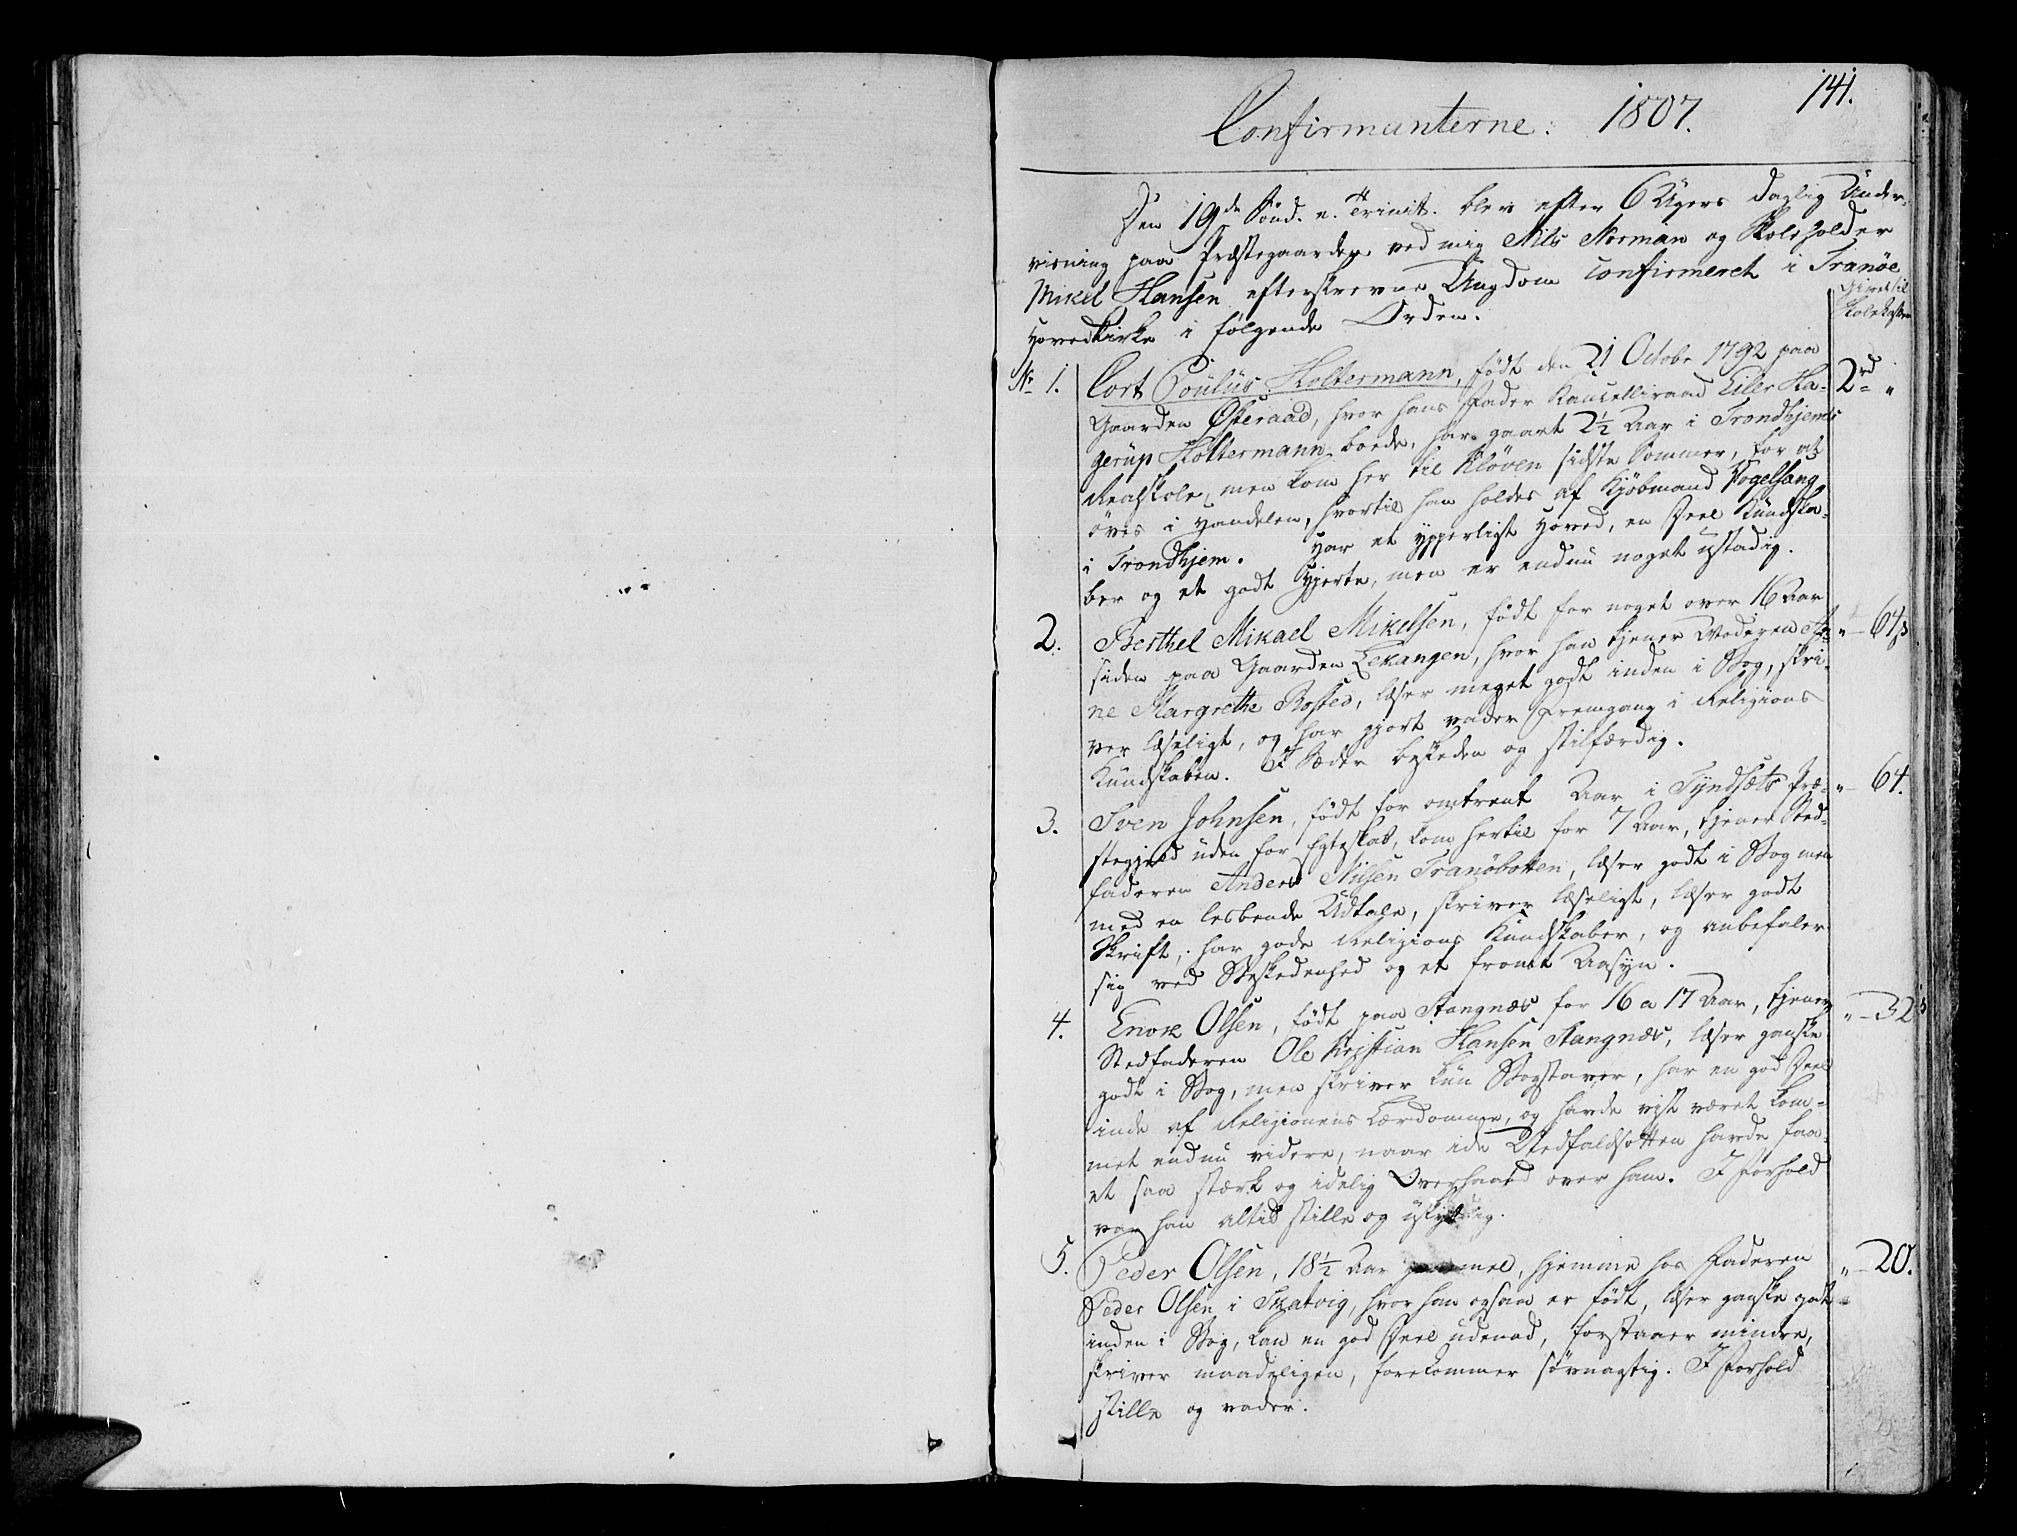 SATØ, Tranøy sokneprestkontor, I/Ia/Iaa/L0003kirke: Ministerialbok nr. 3, 1807-1820, s. 141